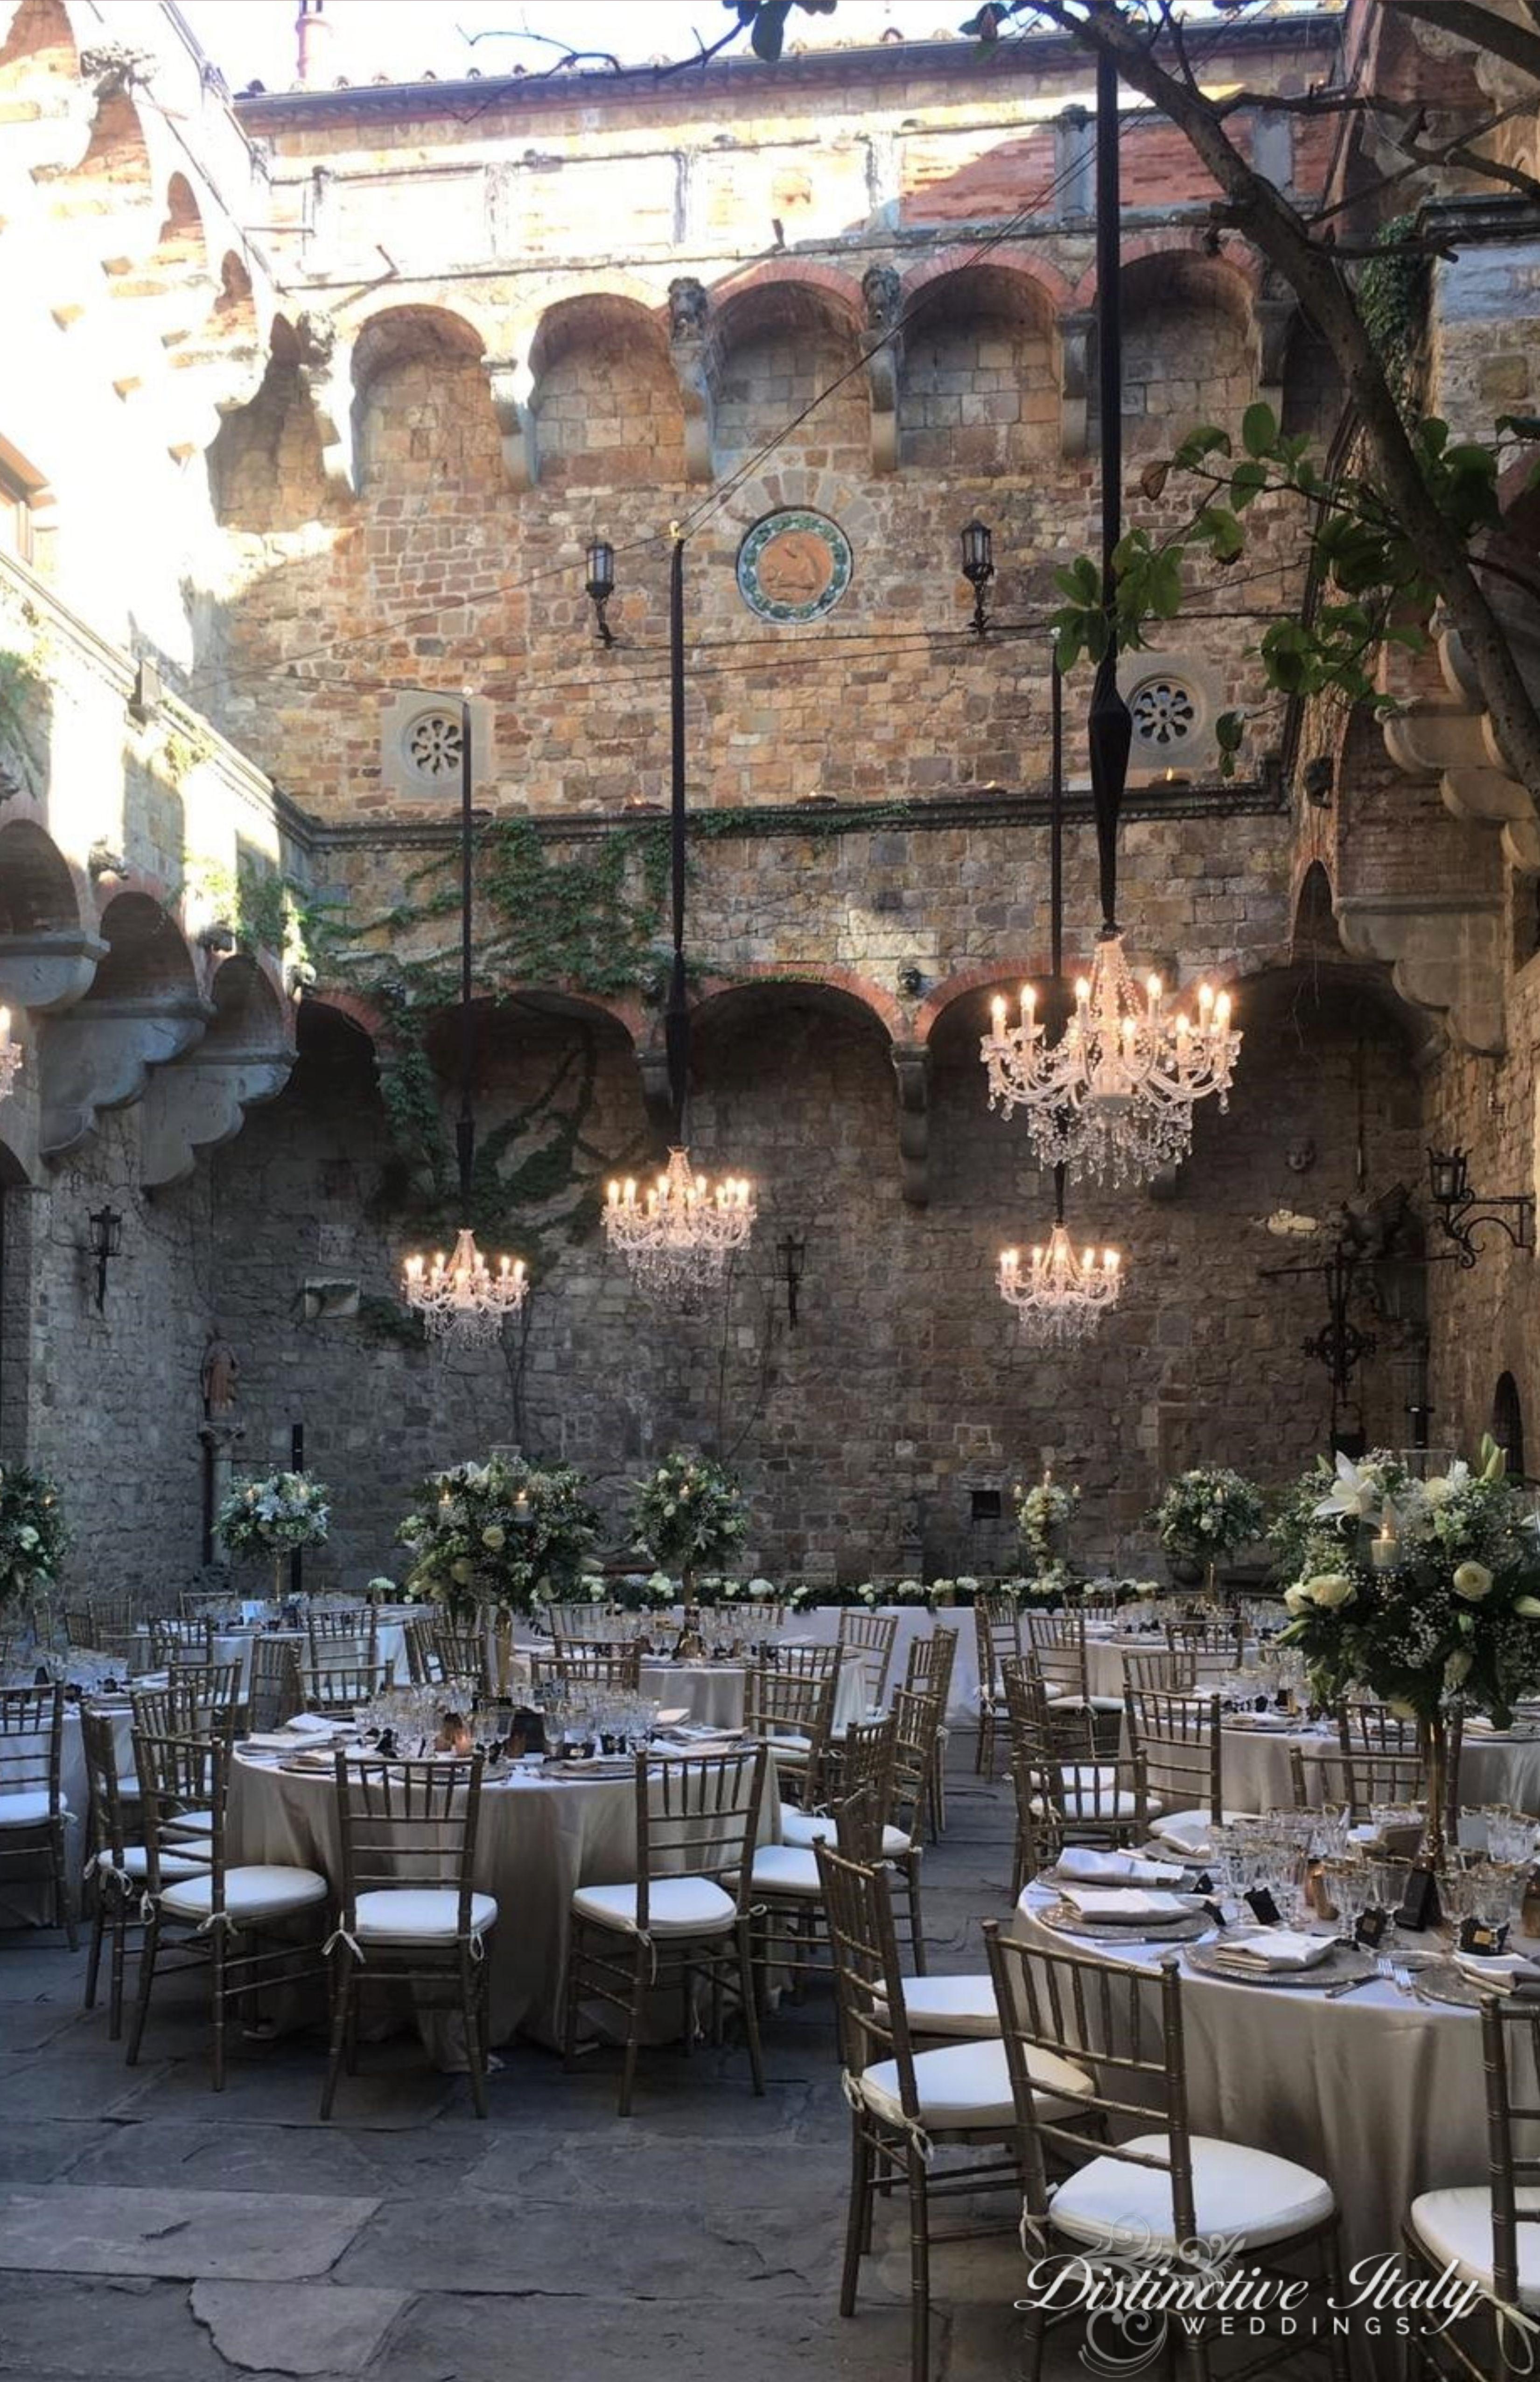 Location Matrimonio Country Chic Toscana : Rustic chic castle wedding in tuscany tuscany vintage weddings